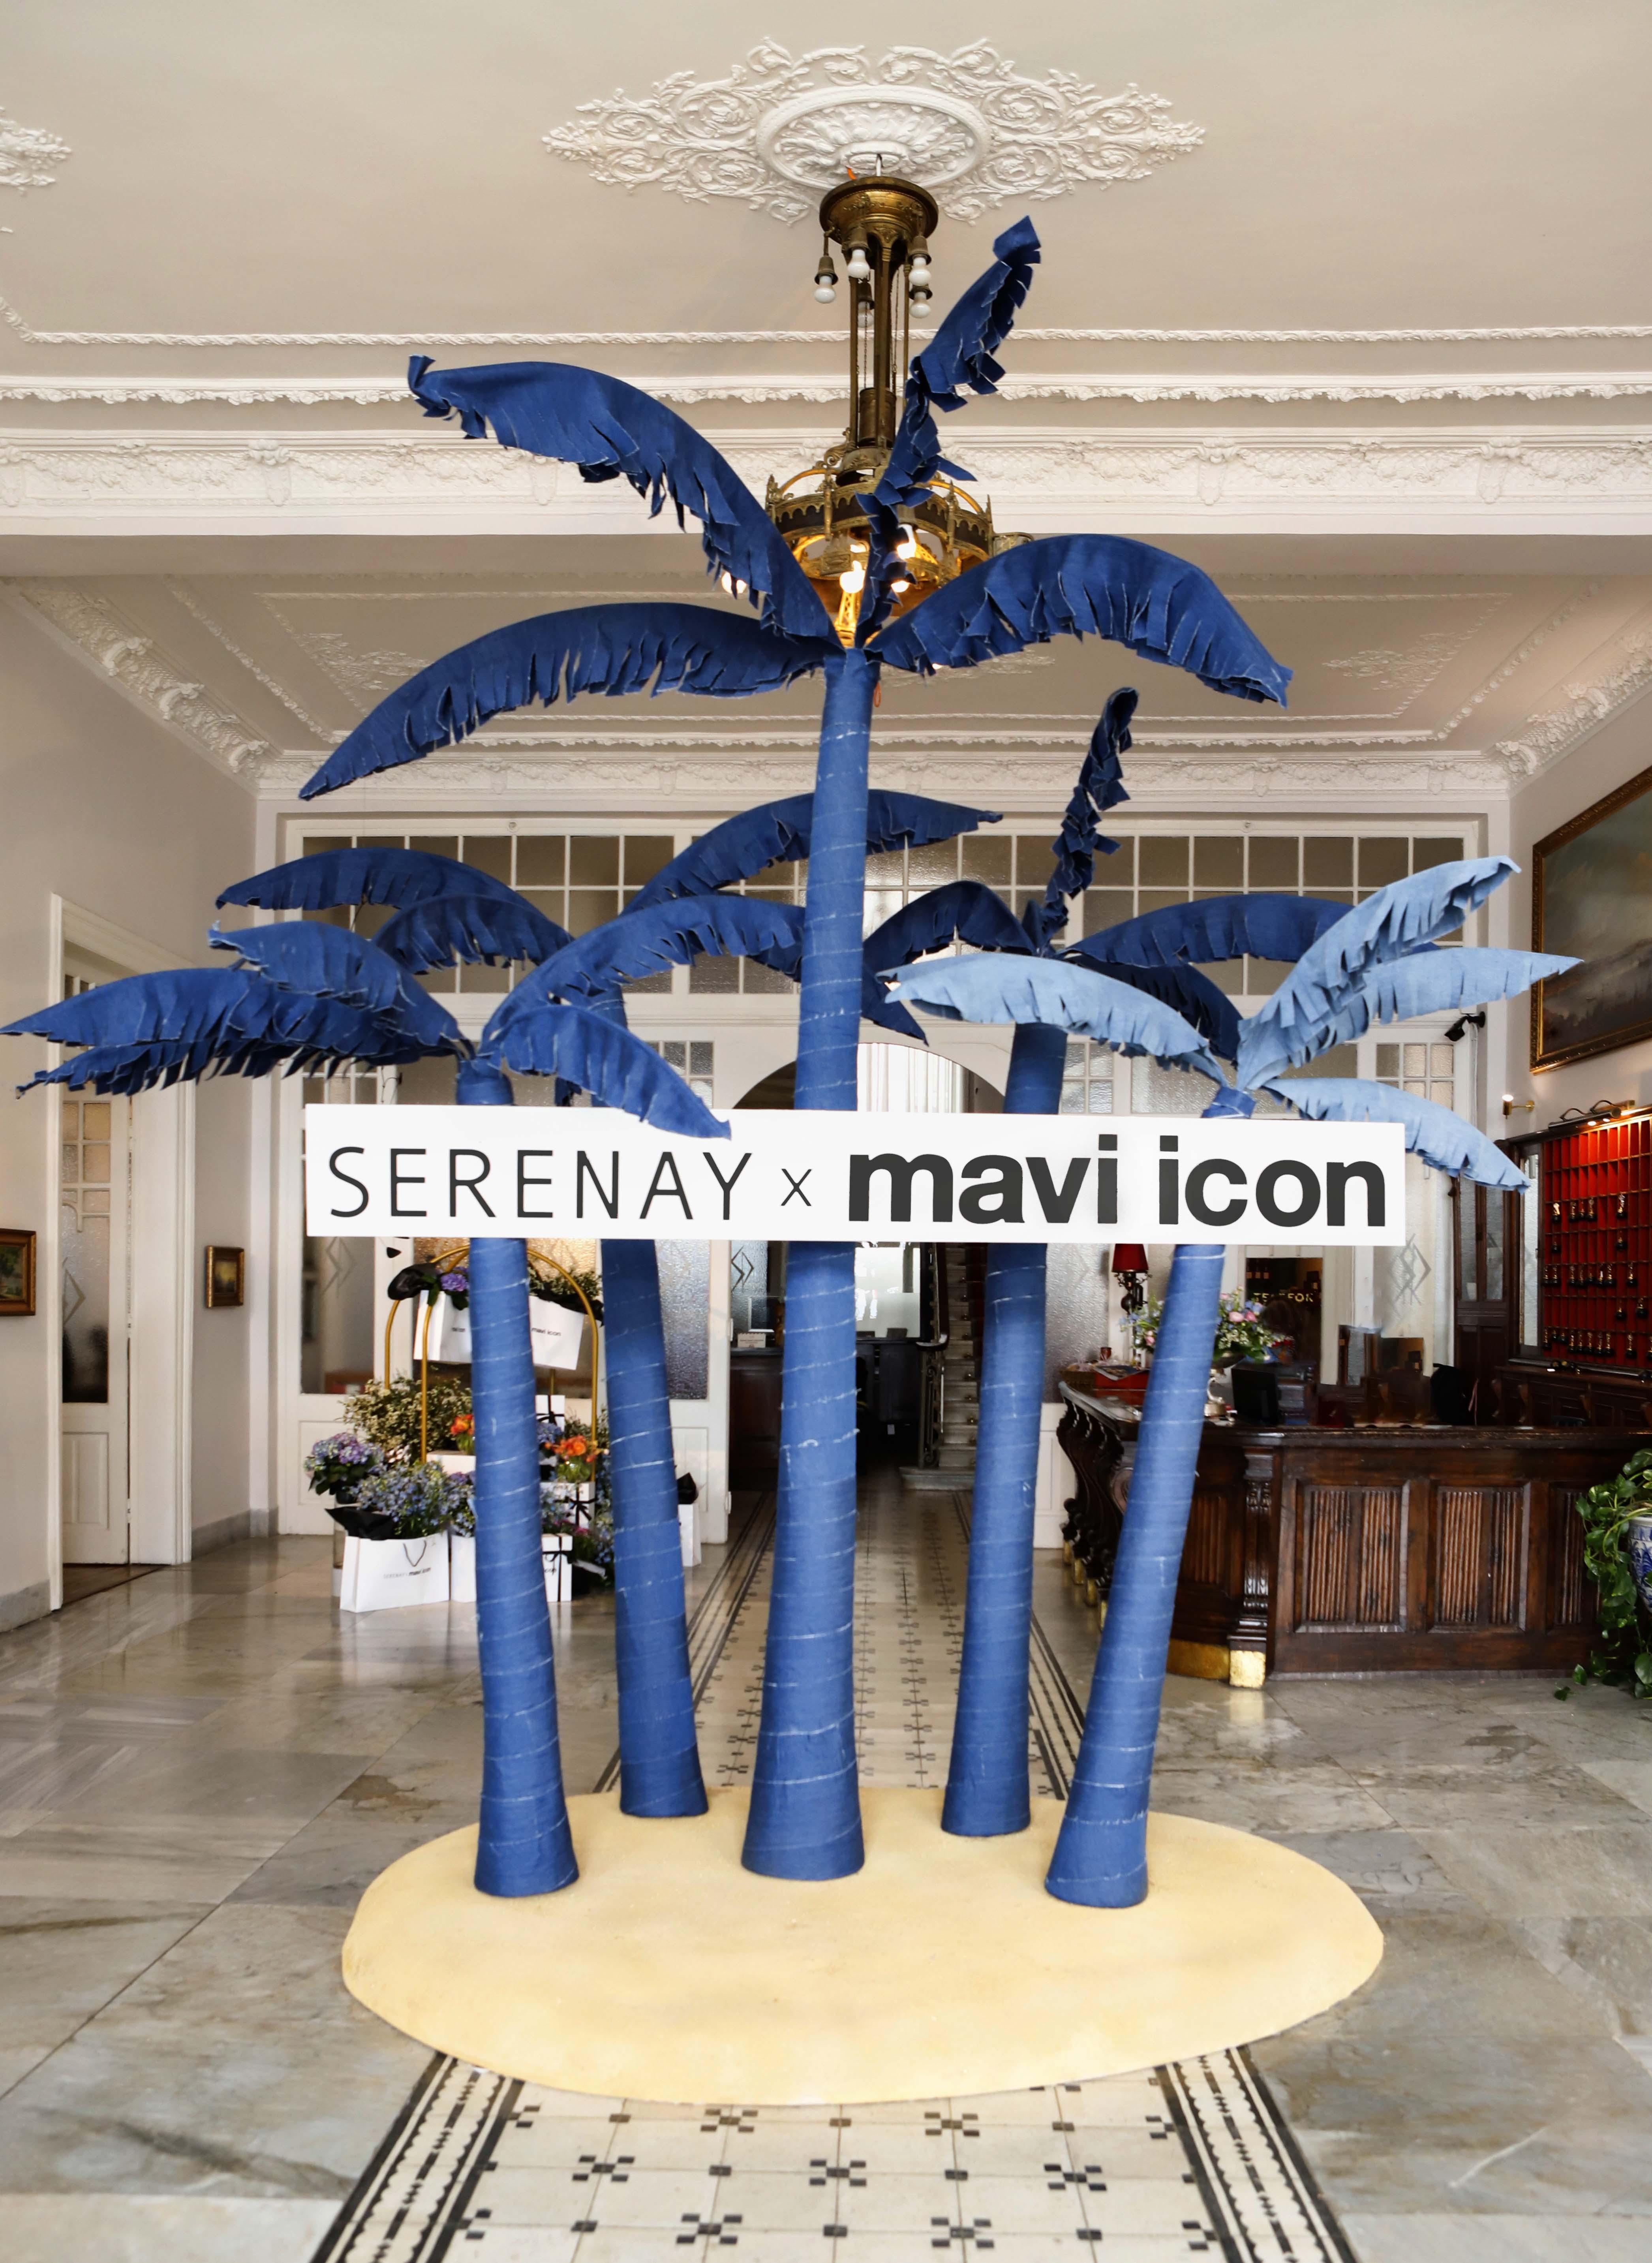 Serenay X Mavi